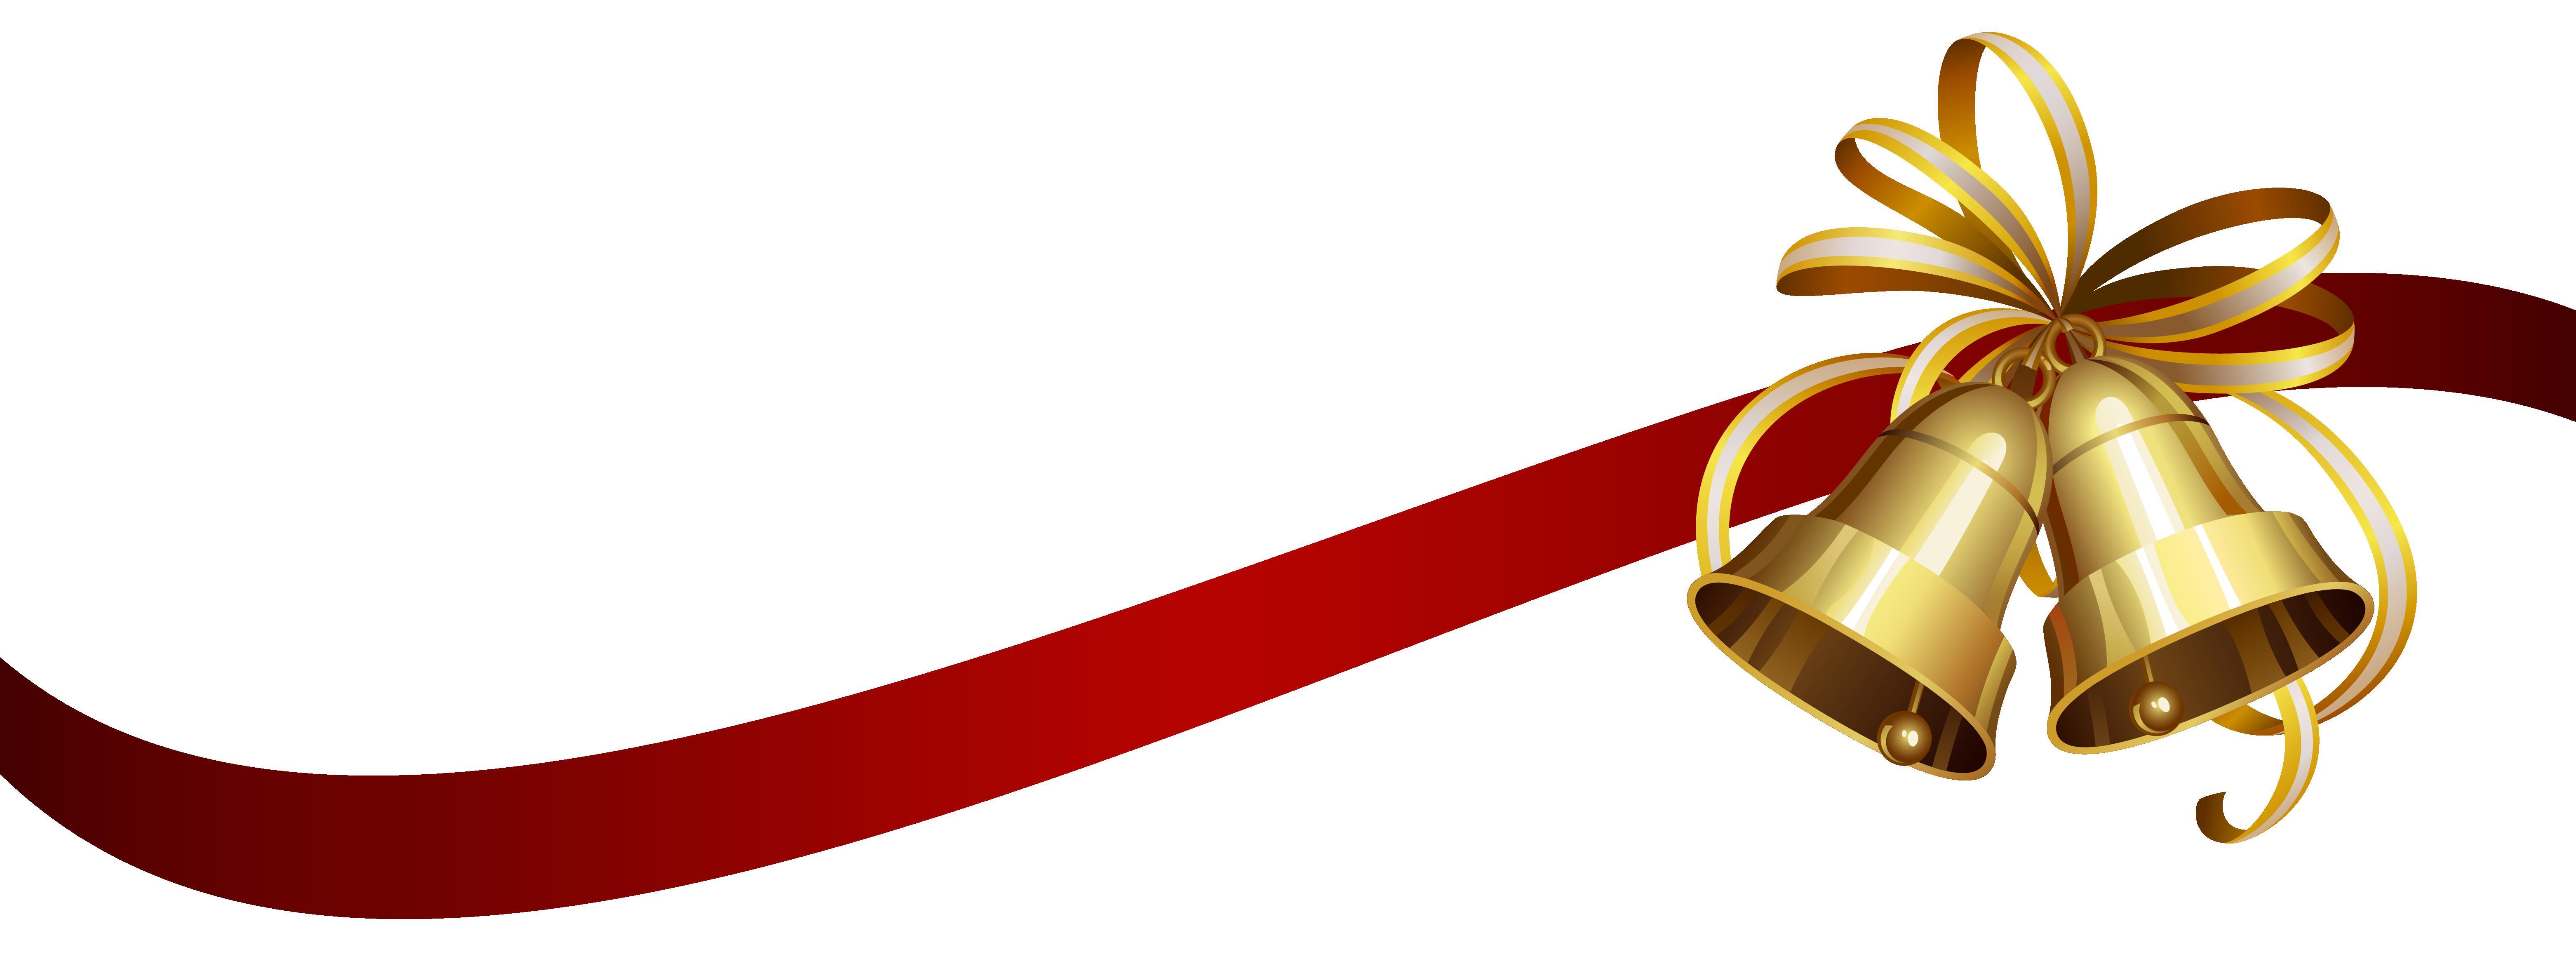 Merry Christmas Ribbon Clipart.Christmas Ribbon Border Free Download Best Christmas